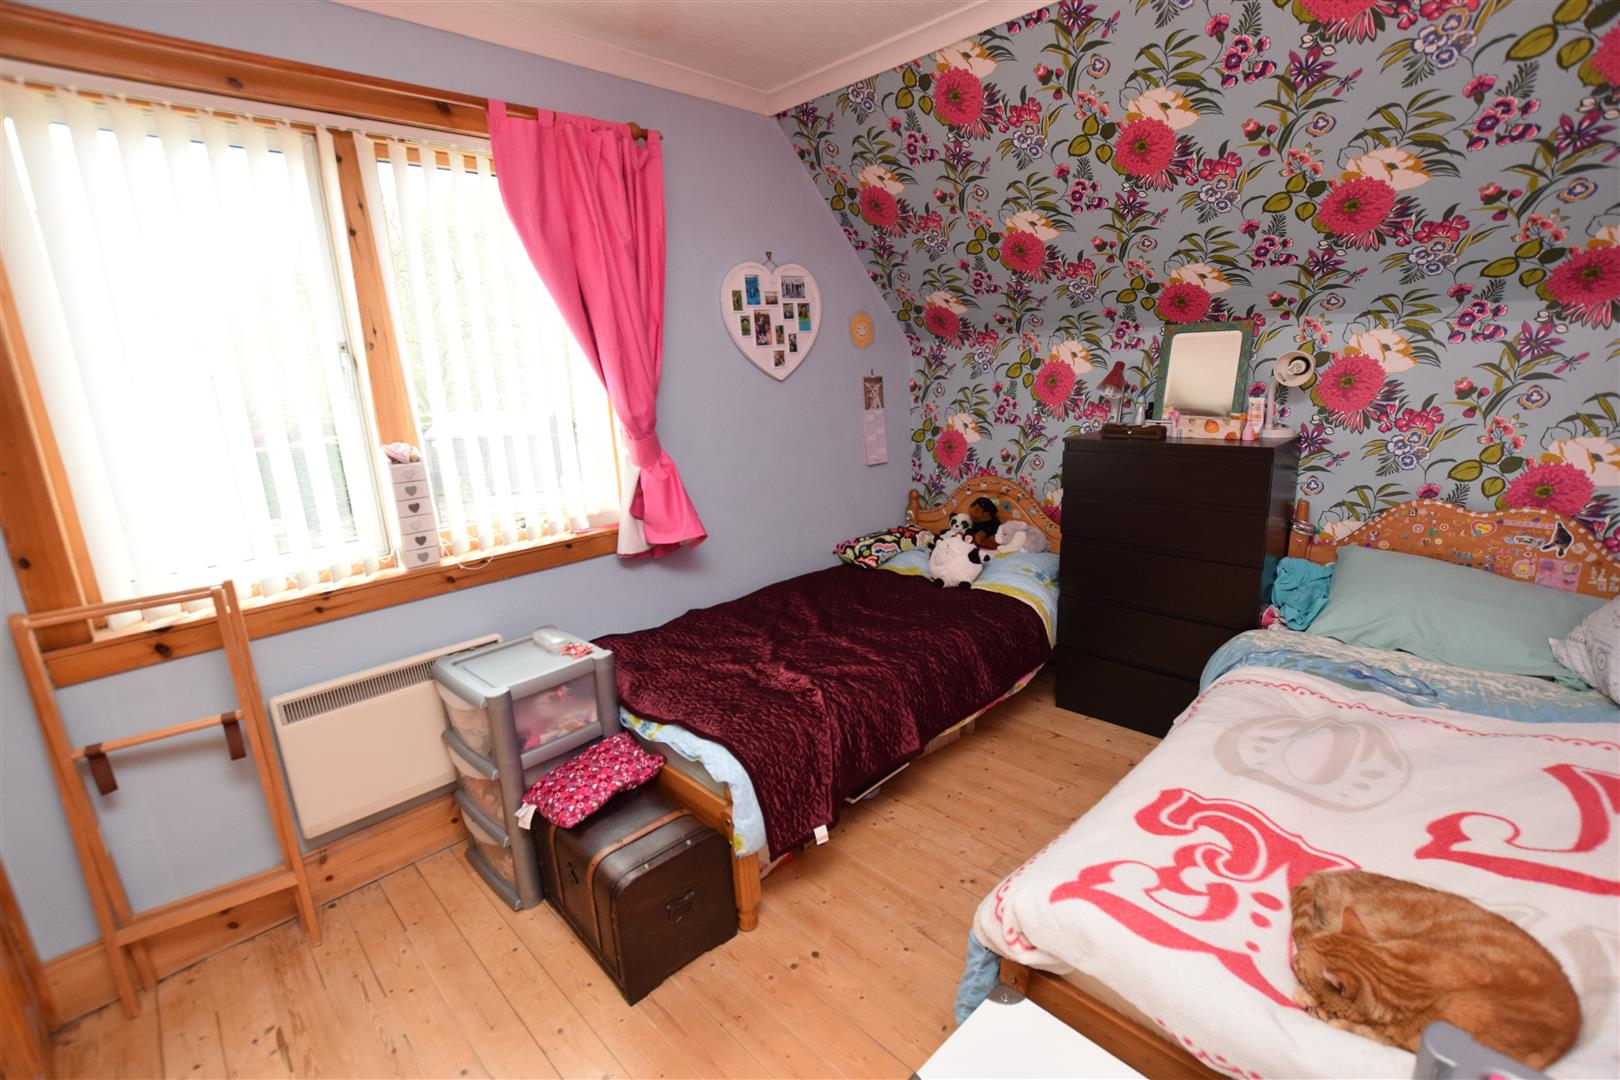 29, Broompark Crescent, Murthly, Perthshire, PH1 4HH, UK